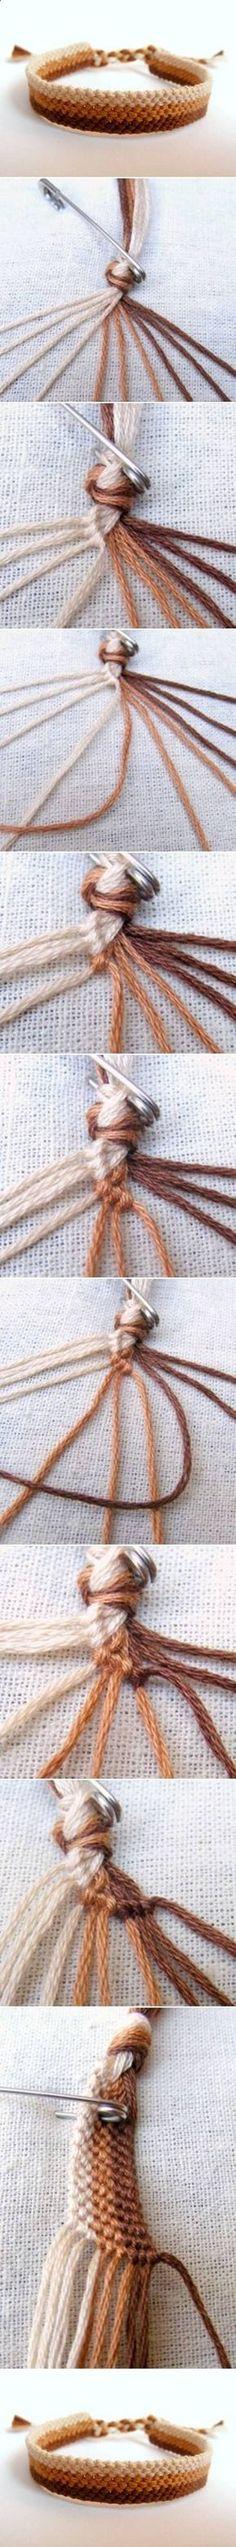 DIY Weave Bracelet